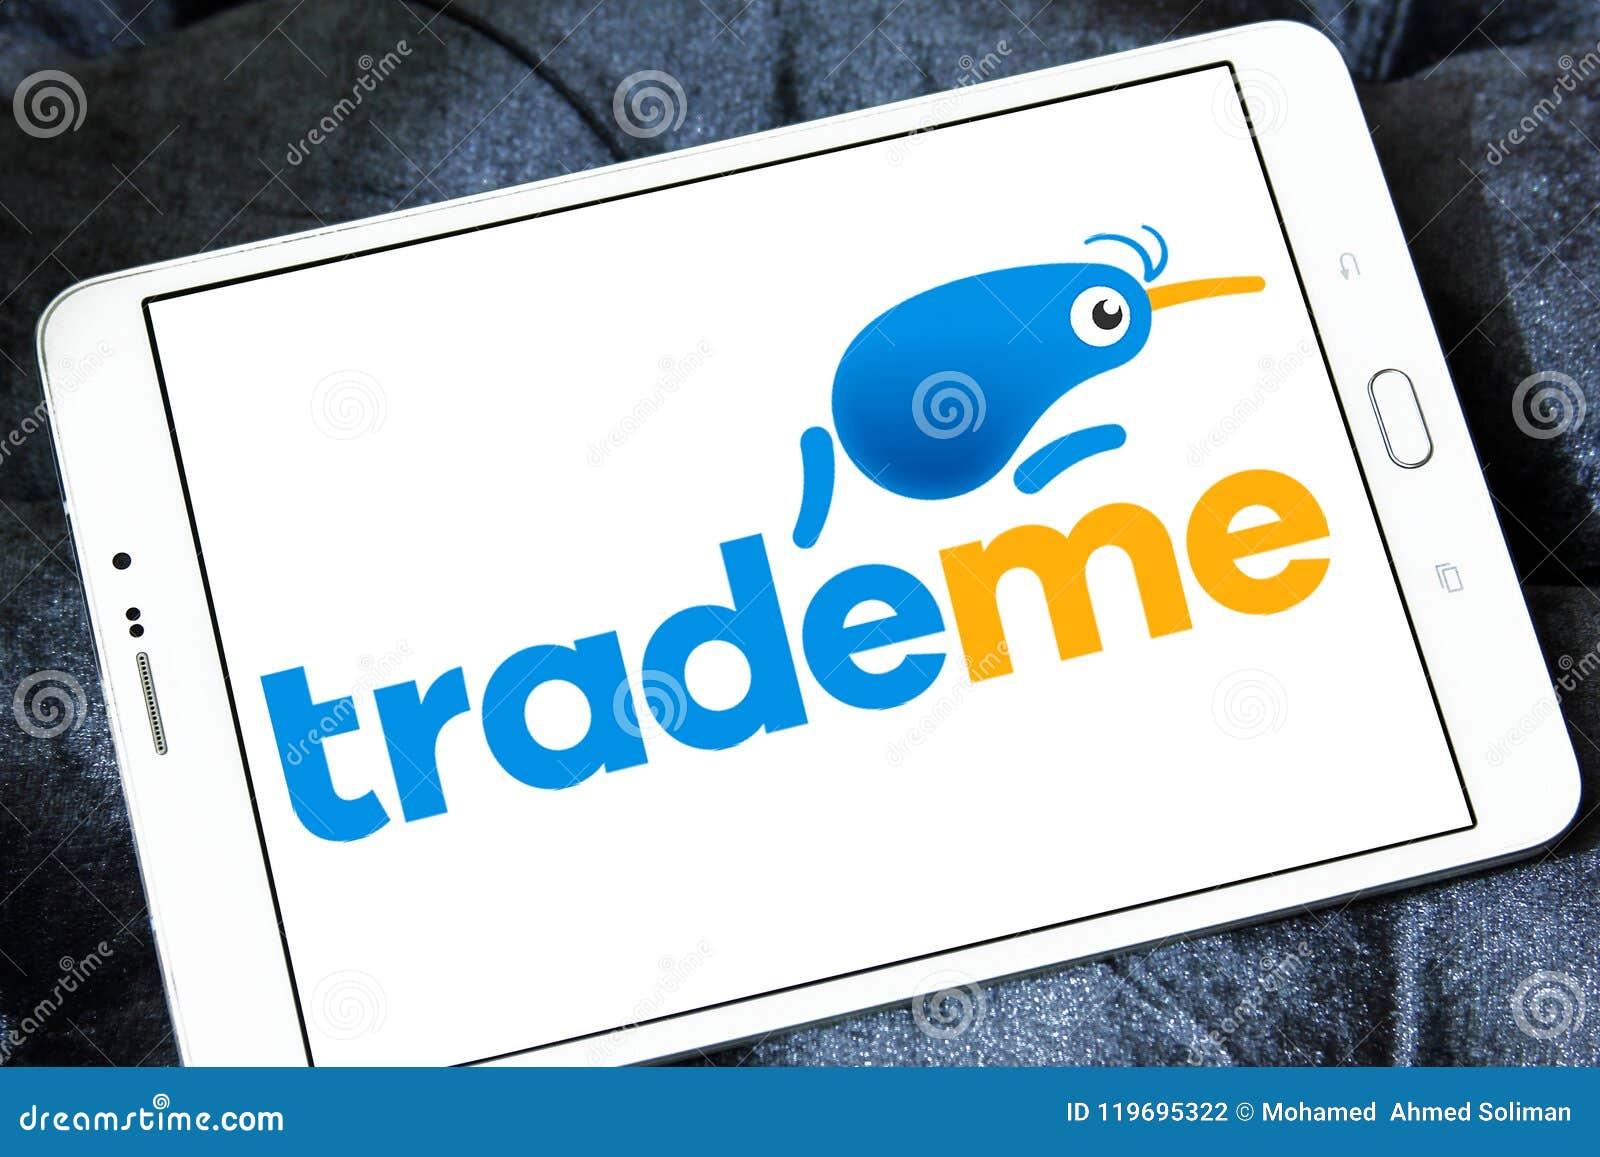 Trade Me Internet Auction Website Logo Editorial Photography Image Of Emblem Trade 119695322